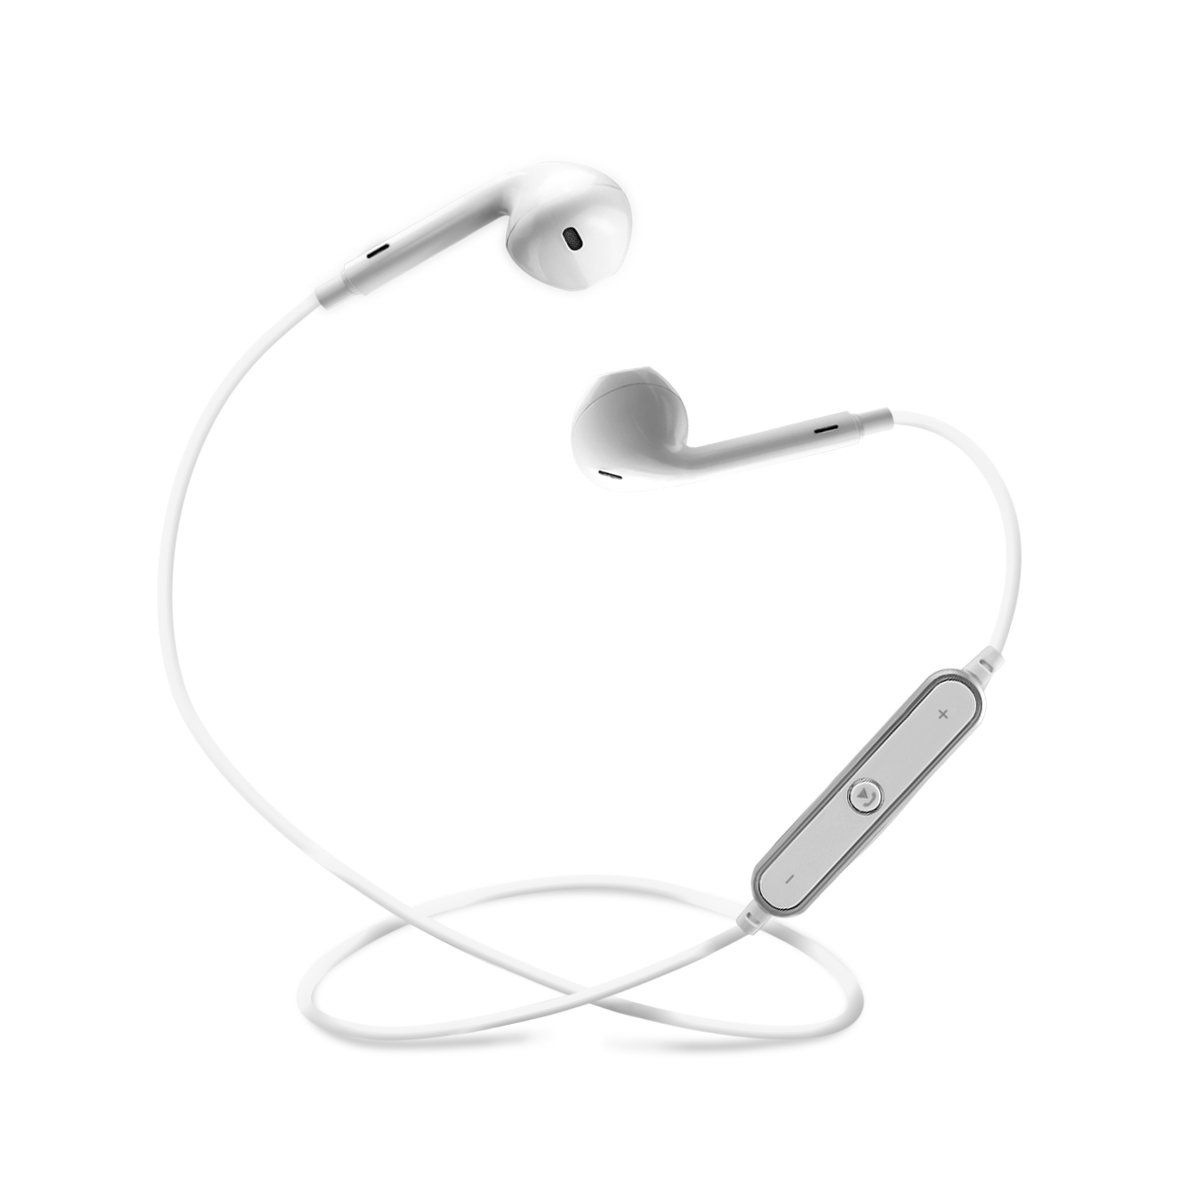 d4bfbb76b2 PLAY X STORE Bluetooth Headphones Cordless Earbuds